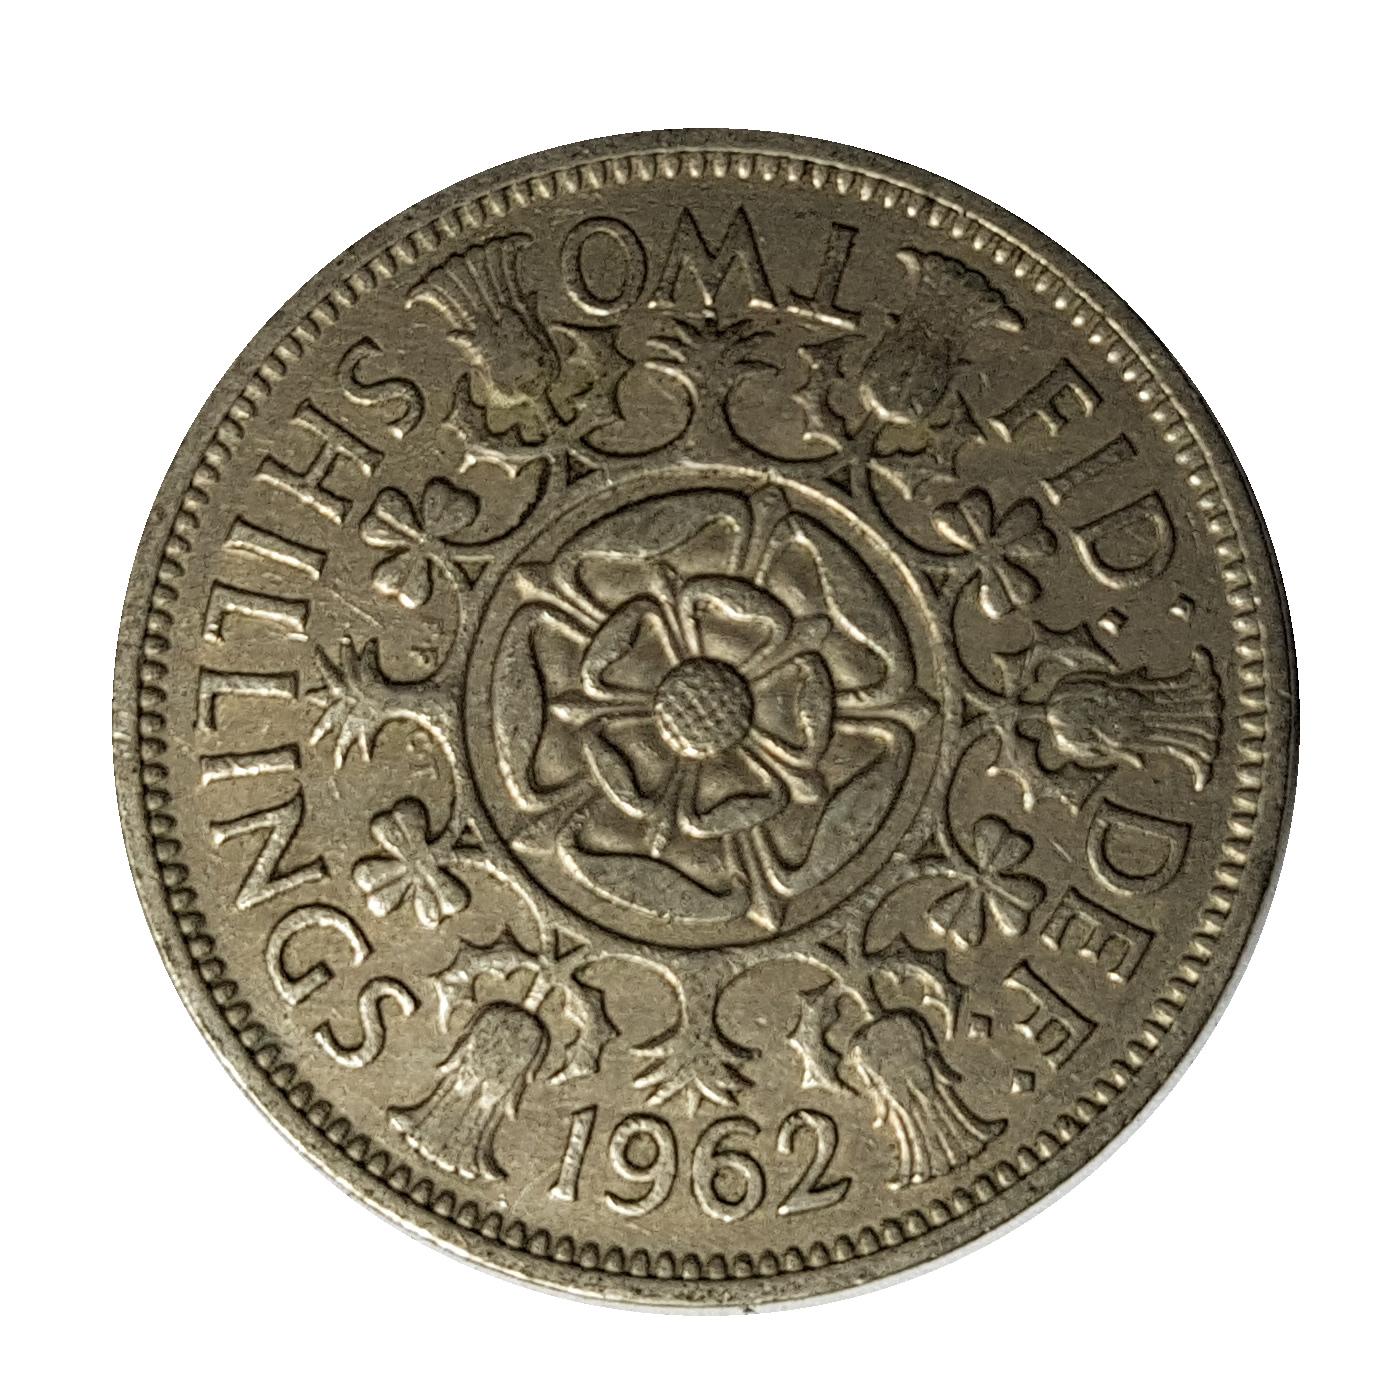 1962 Two Shillings